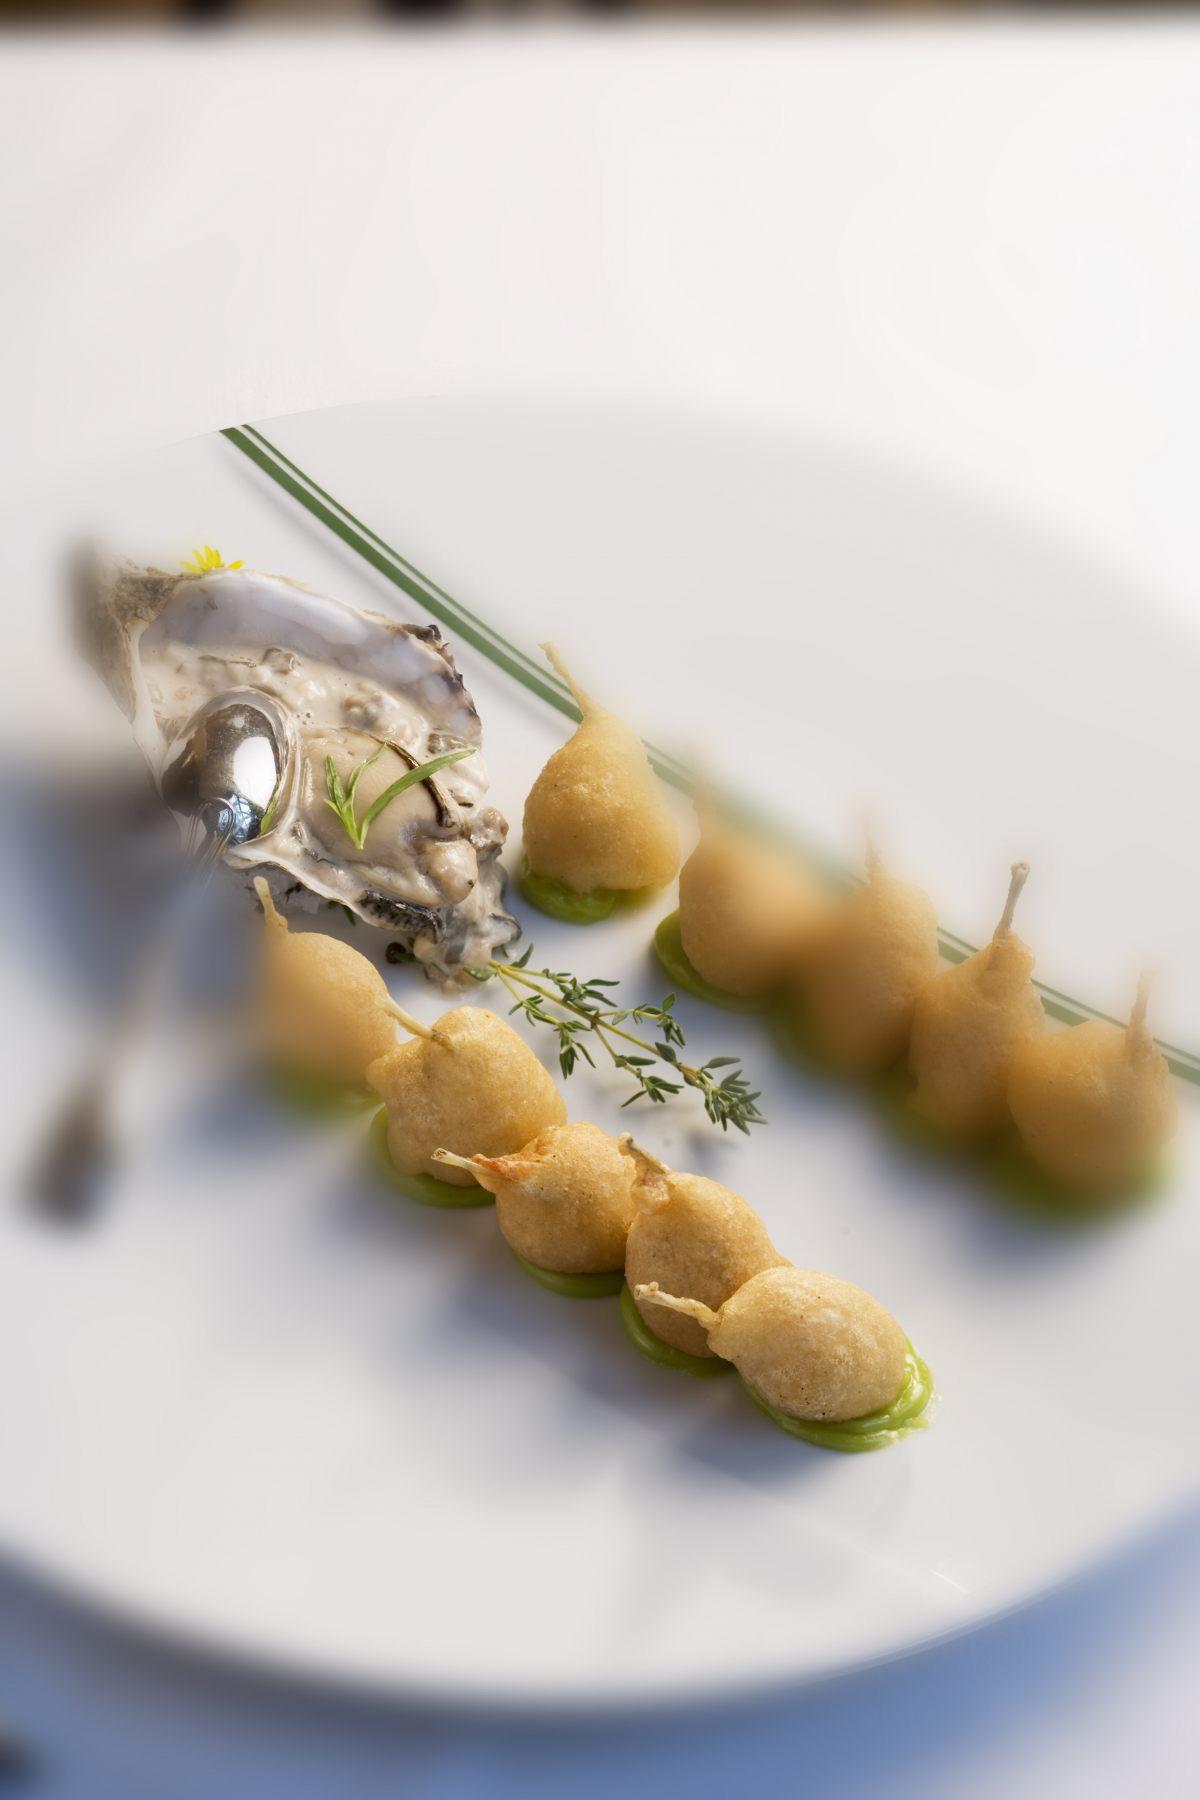 Recette de tempura de cuisses de grenouilles et tartare d - Cuisiner cuisses de grenouilles surgelees ...